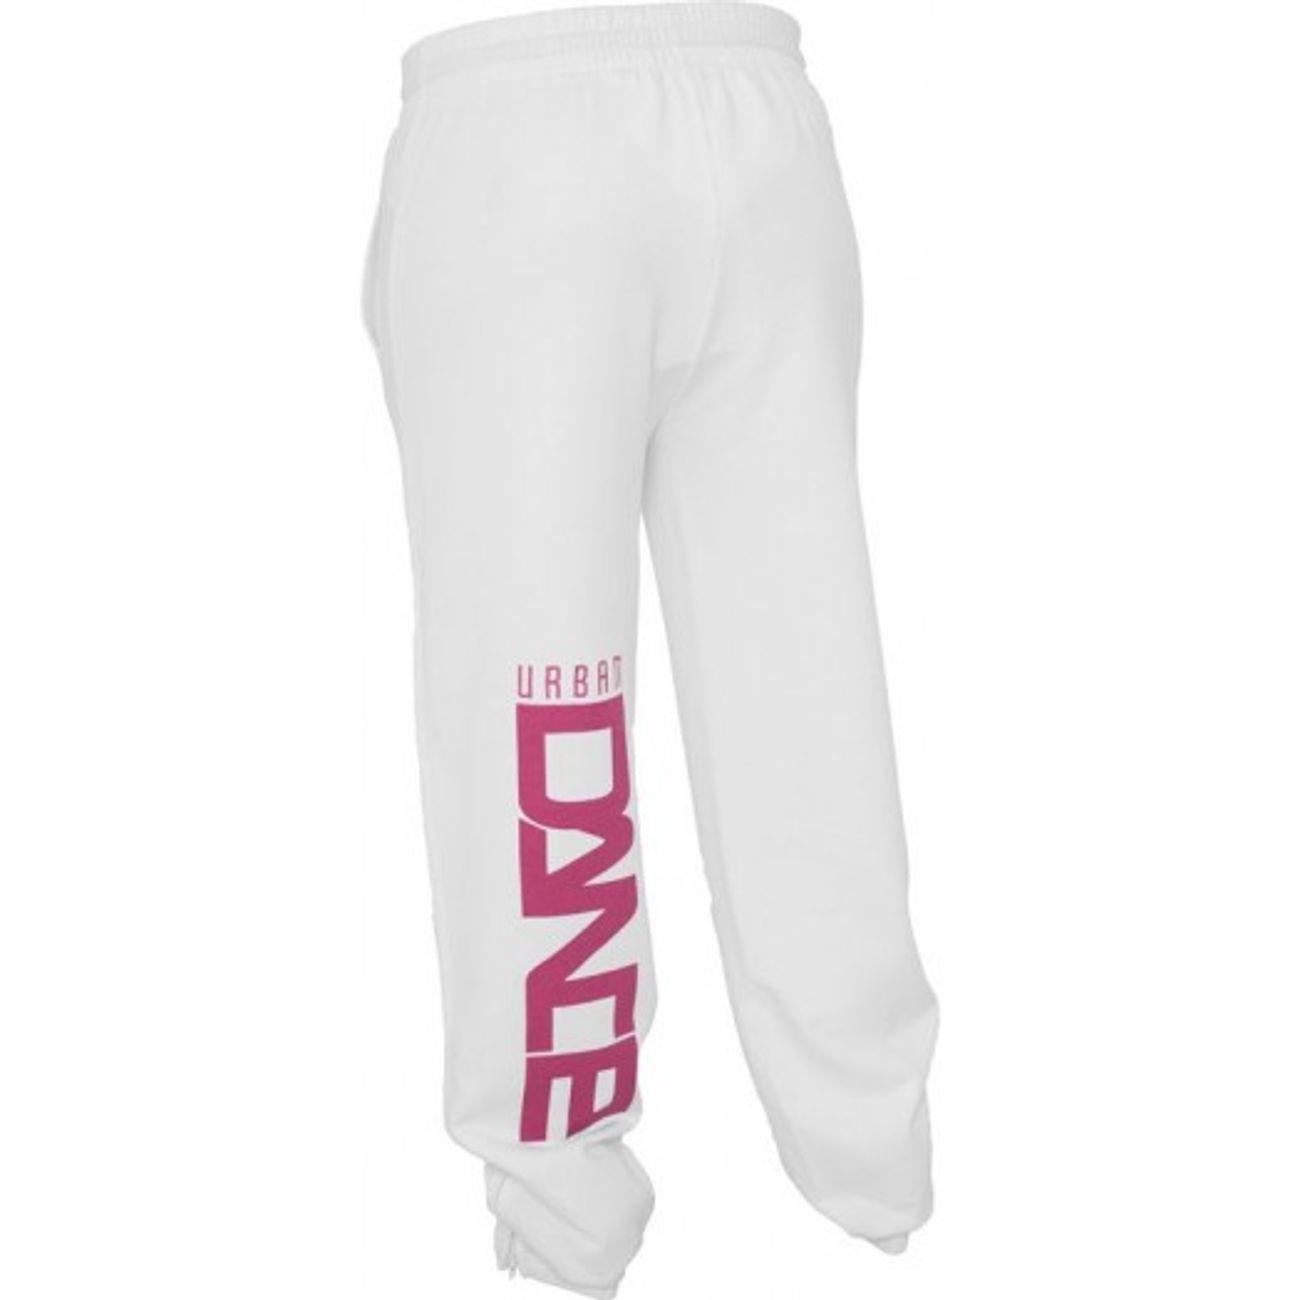 ... Mode- Lifestyle femme URBAN CLASSICS Bas de jogging URBAN DANCE Blanc    Rose Pantalon Danse 196c98b1f15